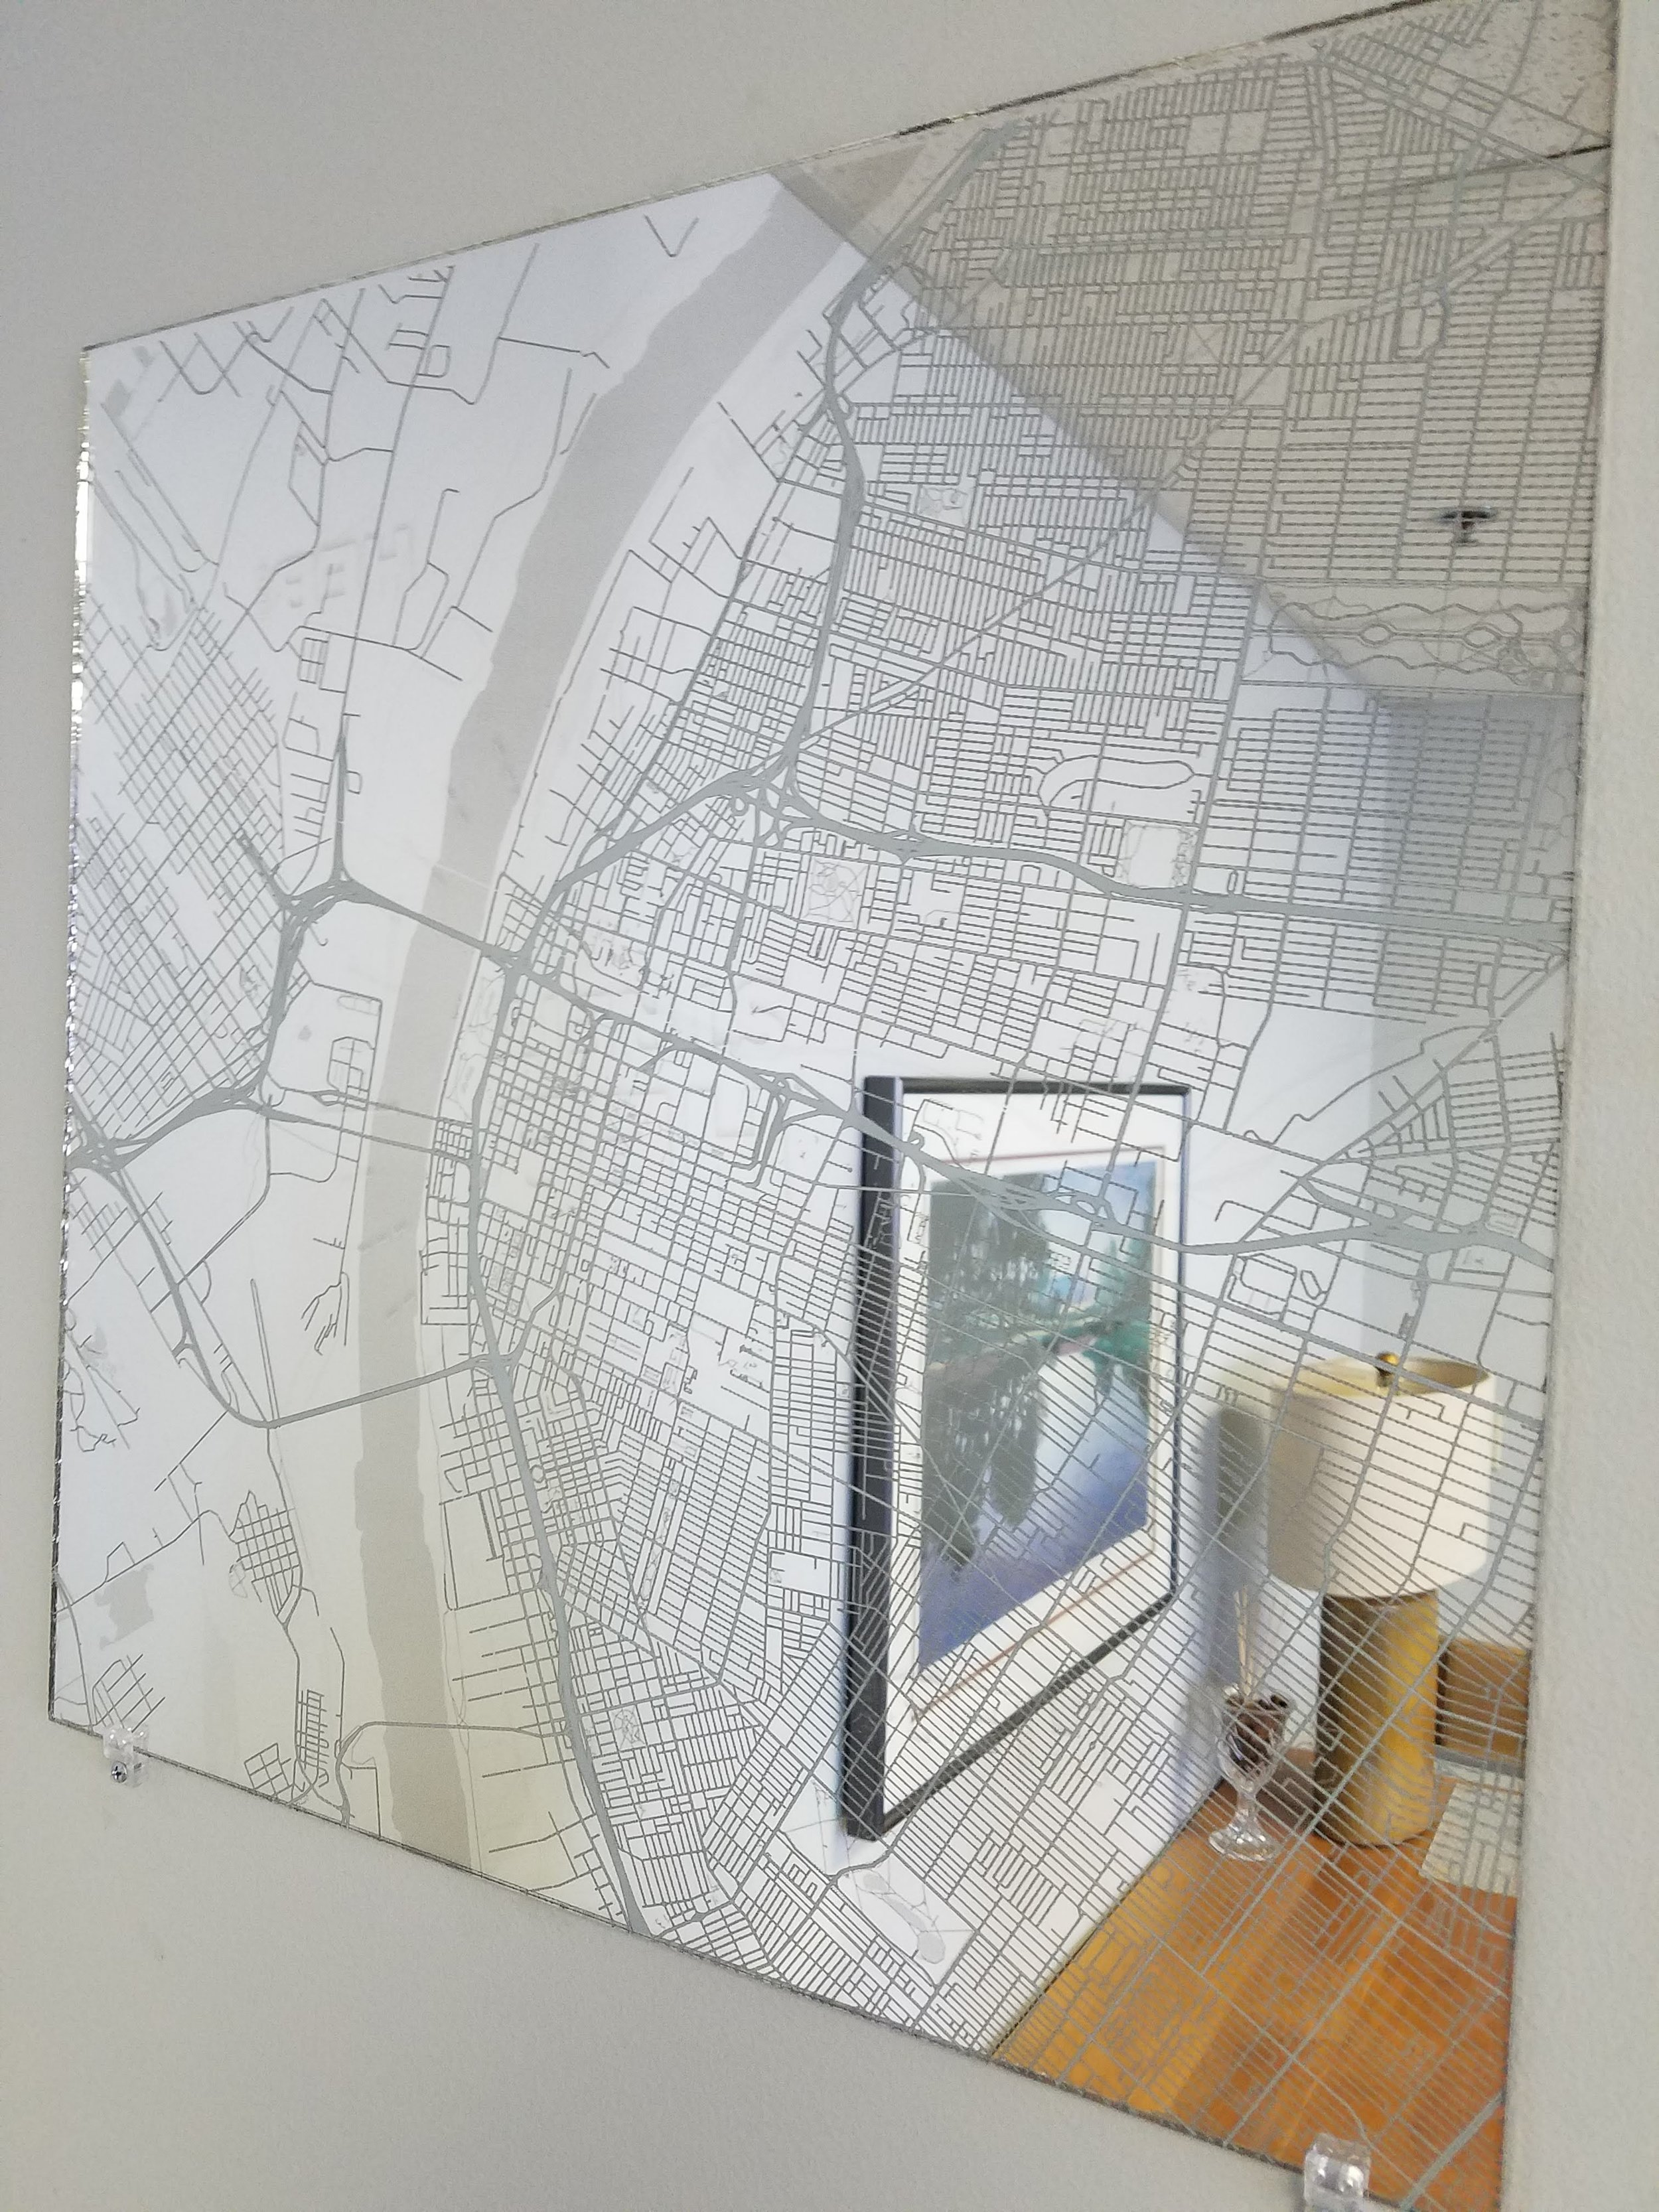 Digital Map on Mirror.jpg